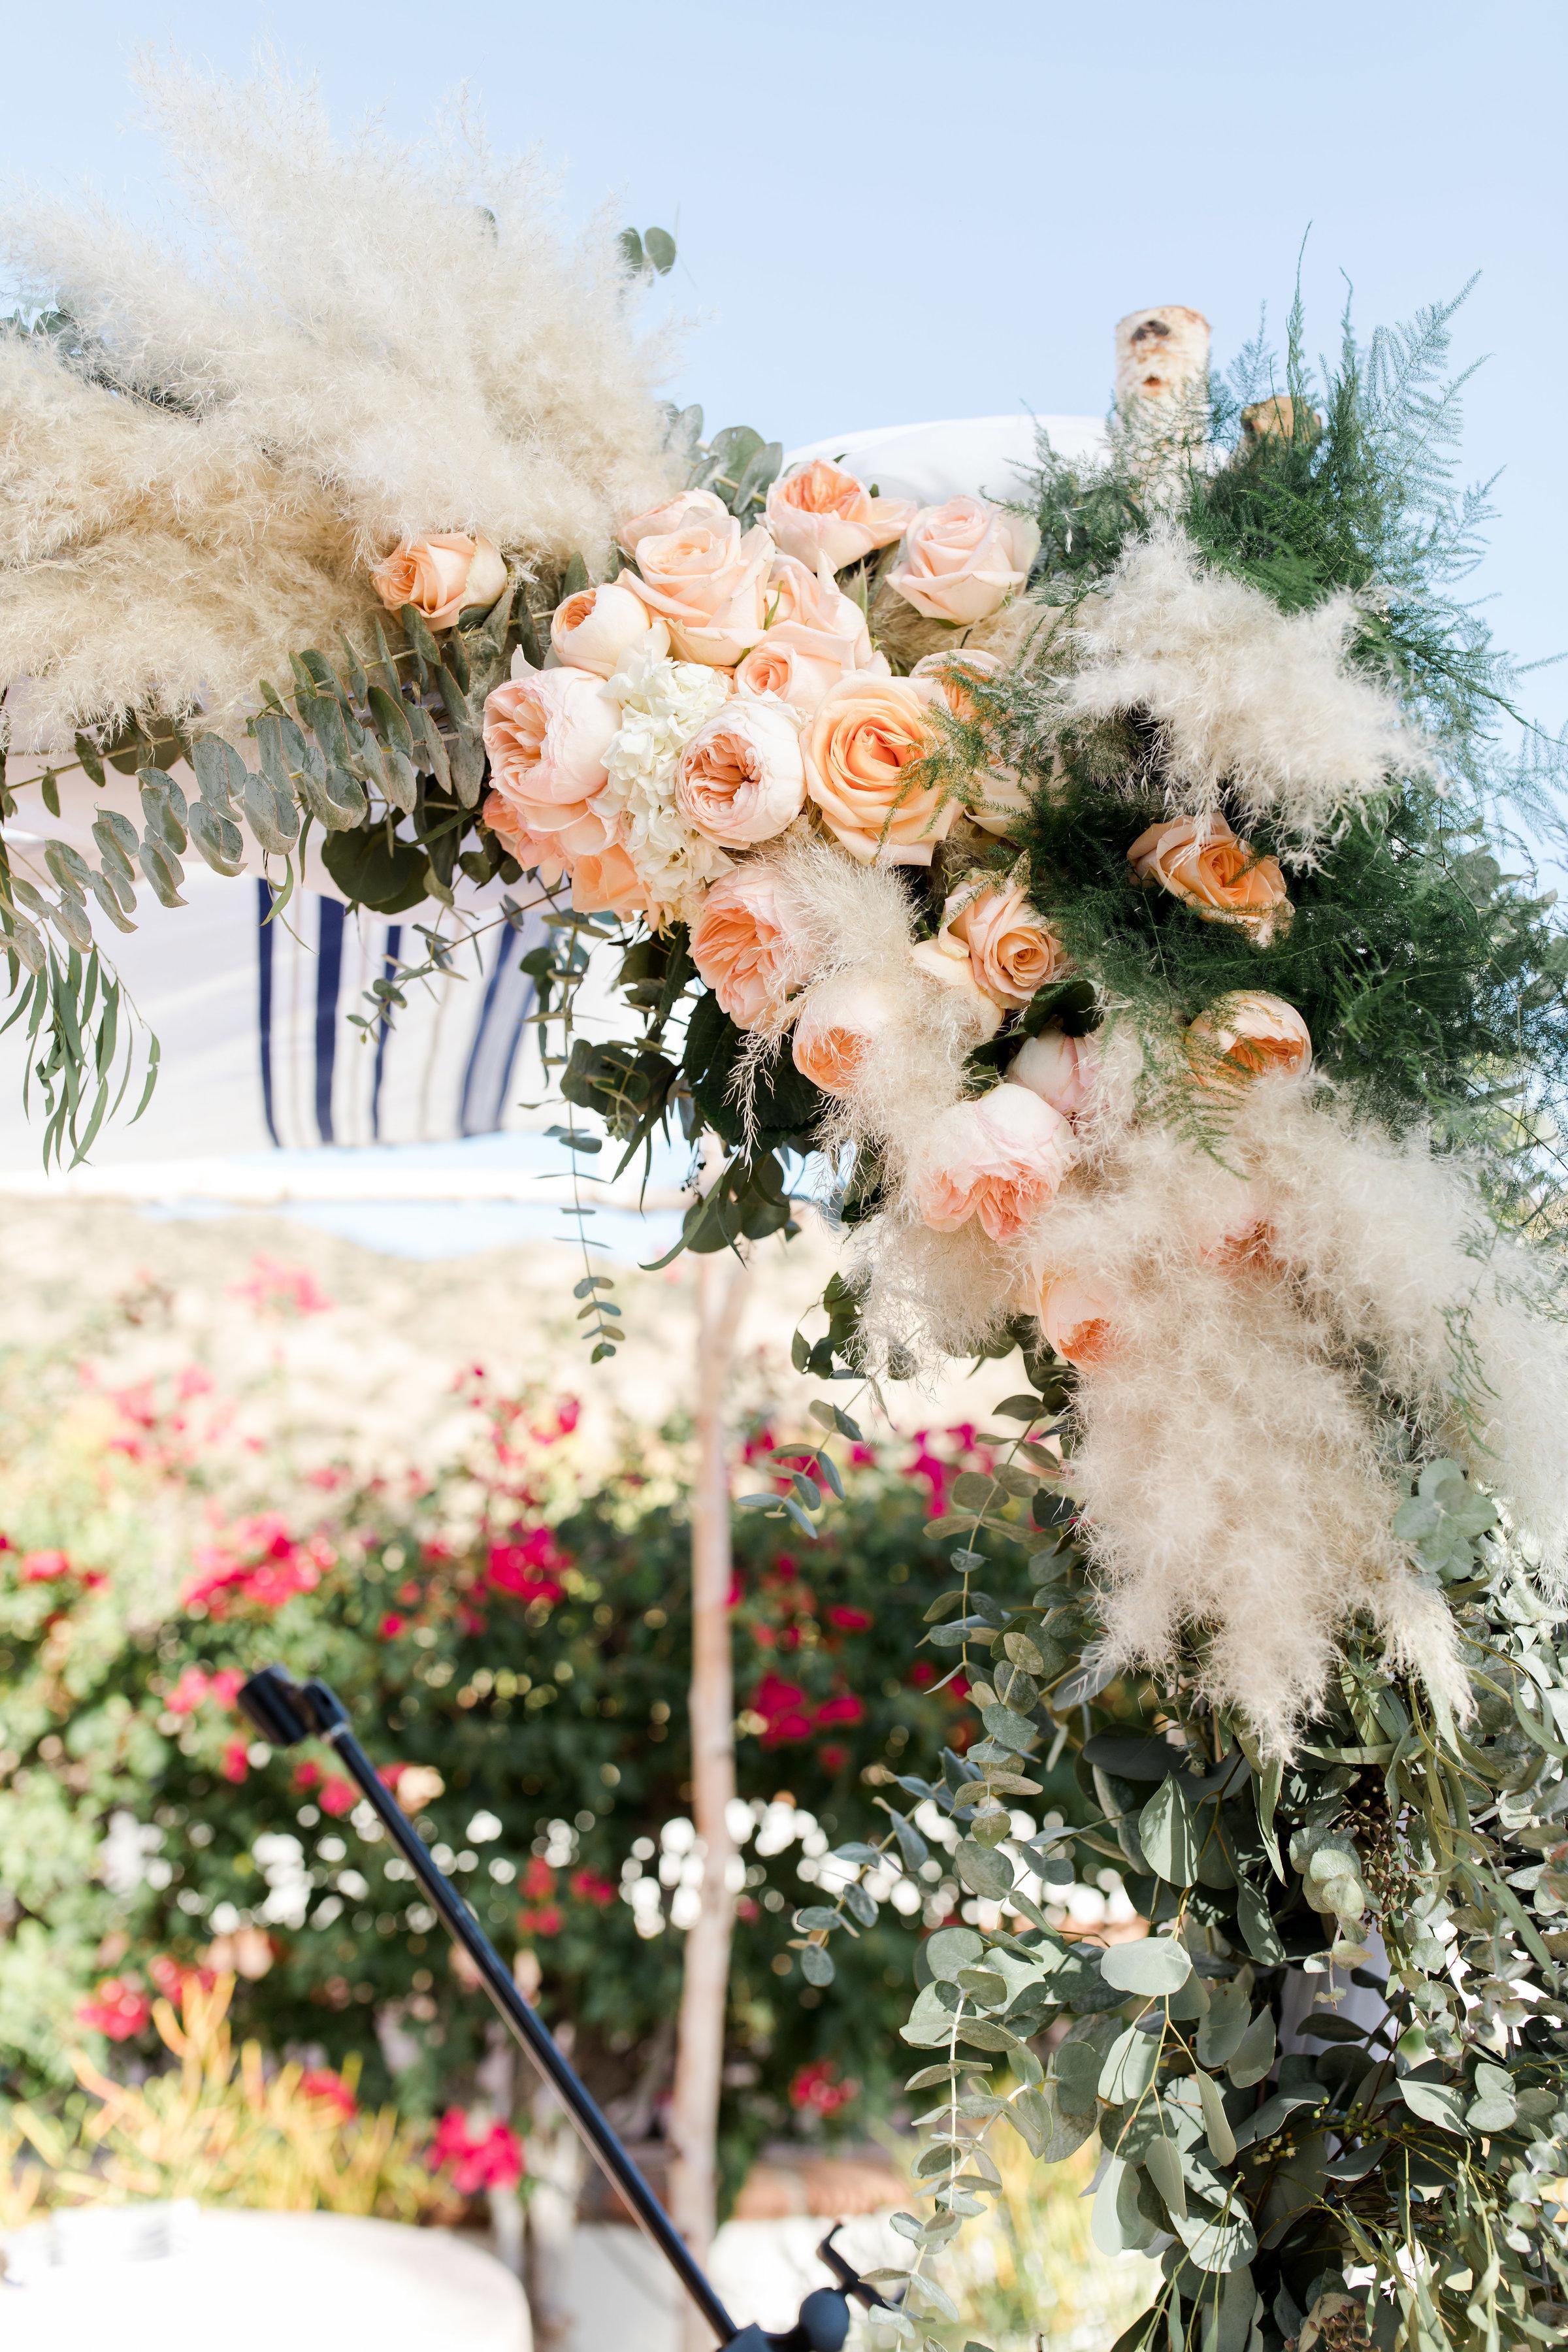 JennyQuicksallPhotography_www.jennyquicksall.com_HummingbirdNestRanchWedding_-339.jpg